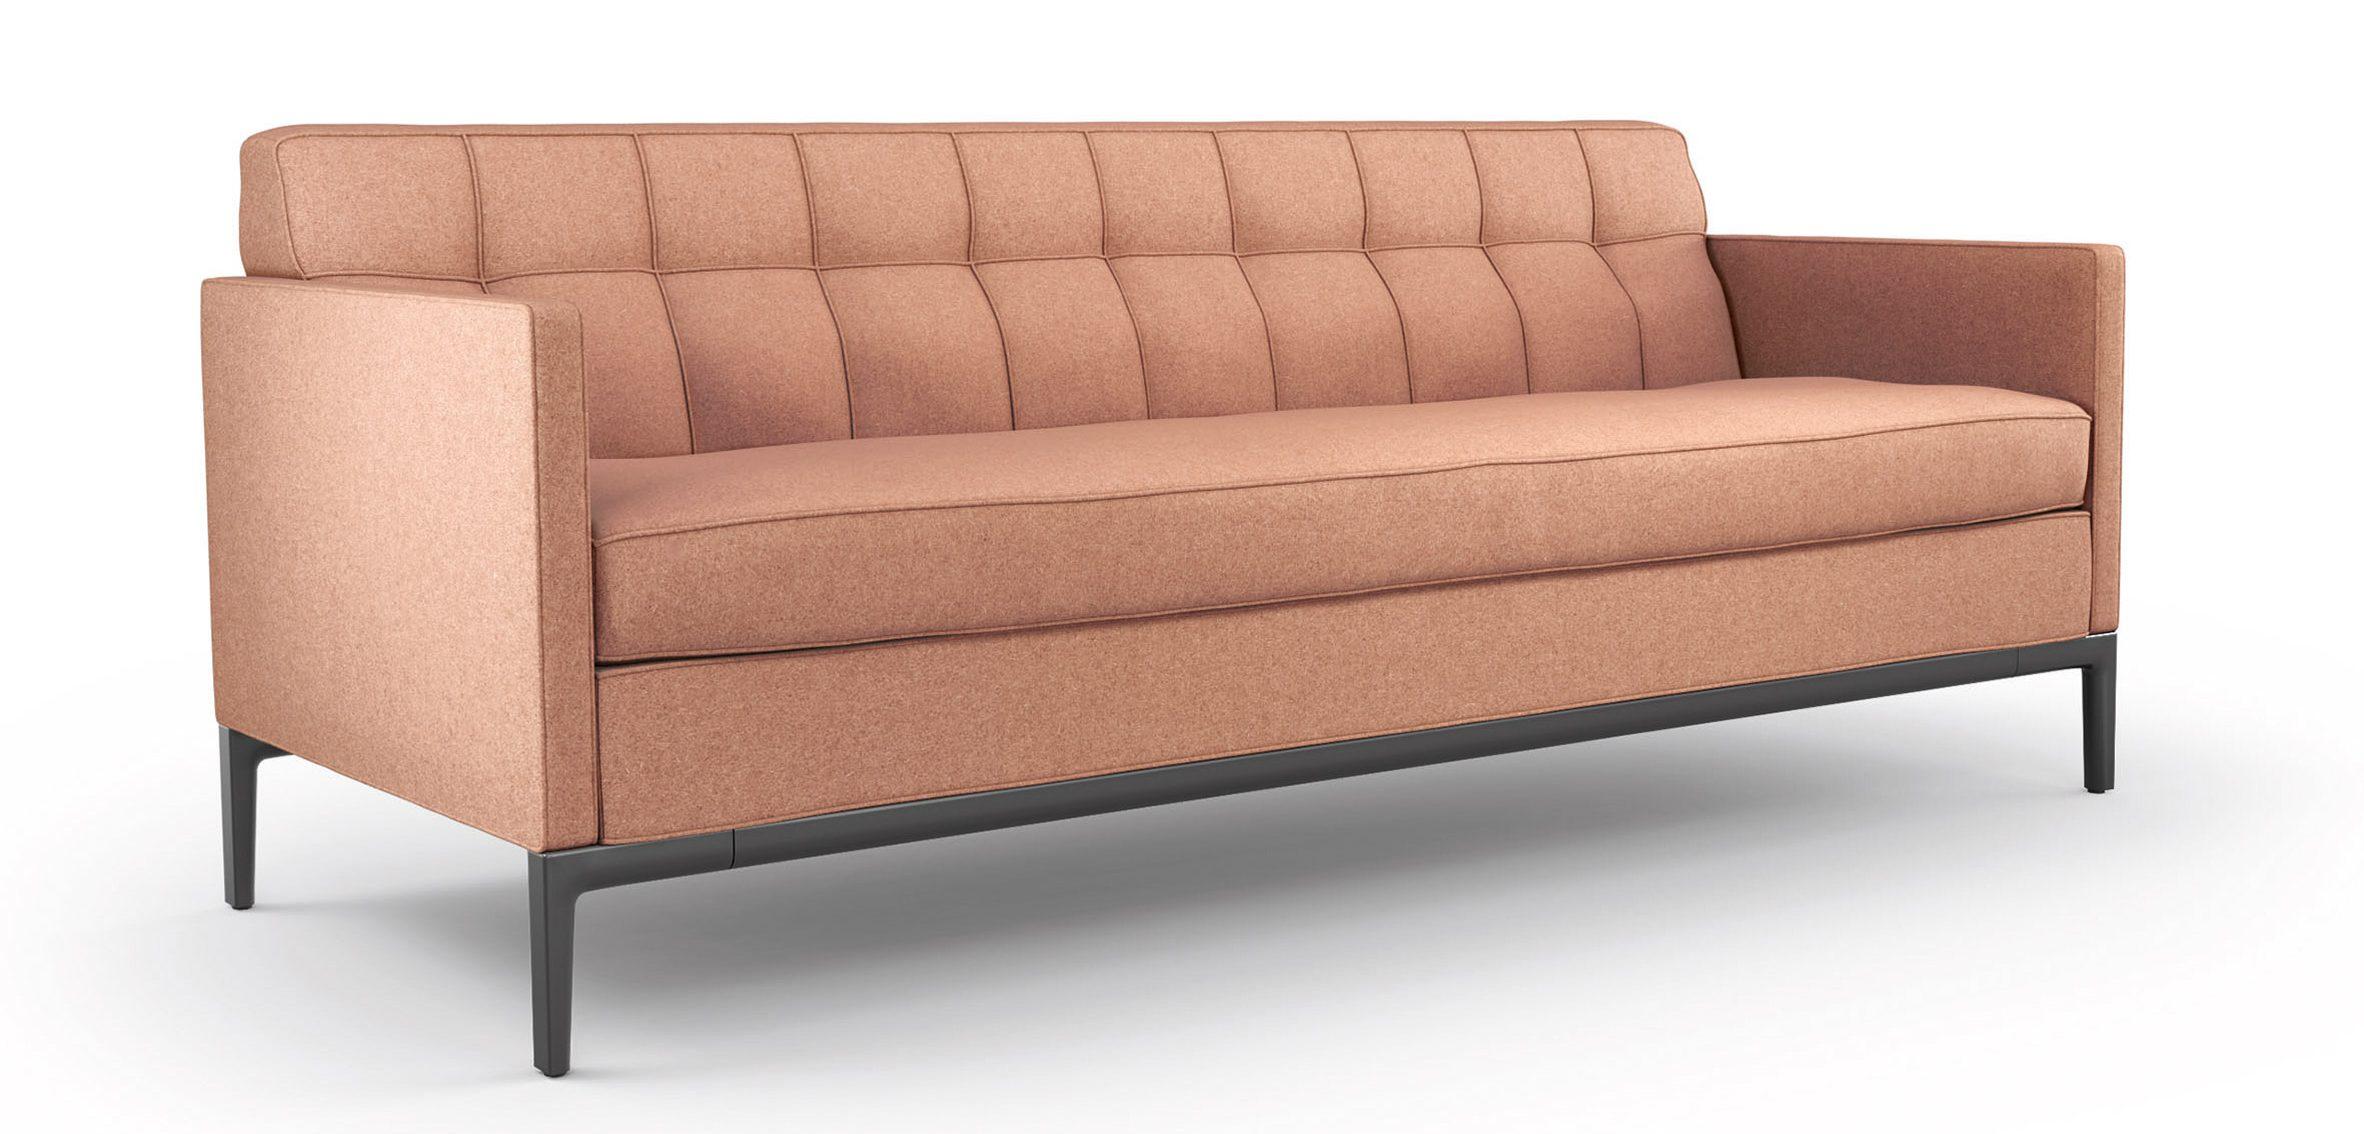 Peach coloured Volage EX-S Slim sofa with black frame